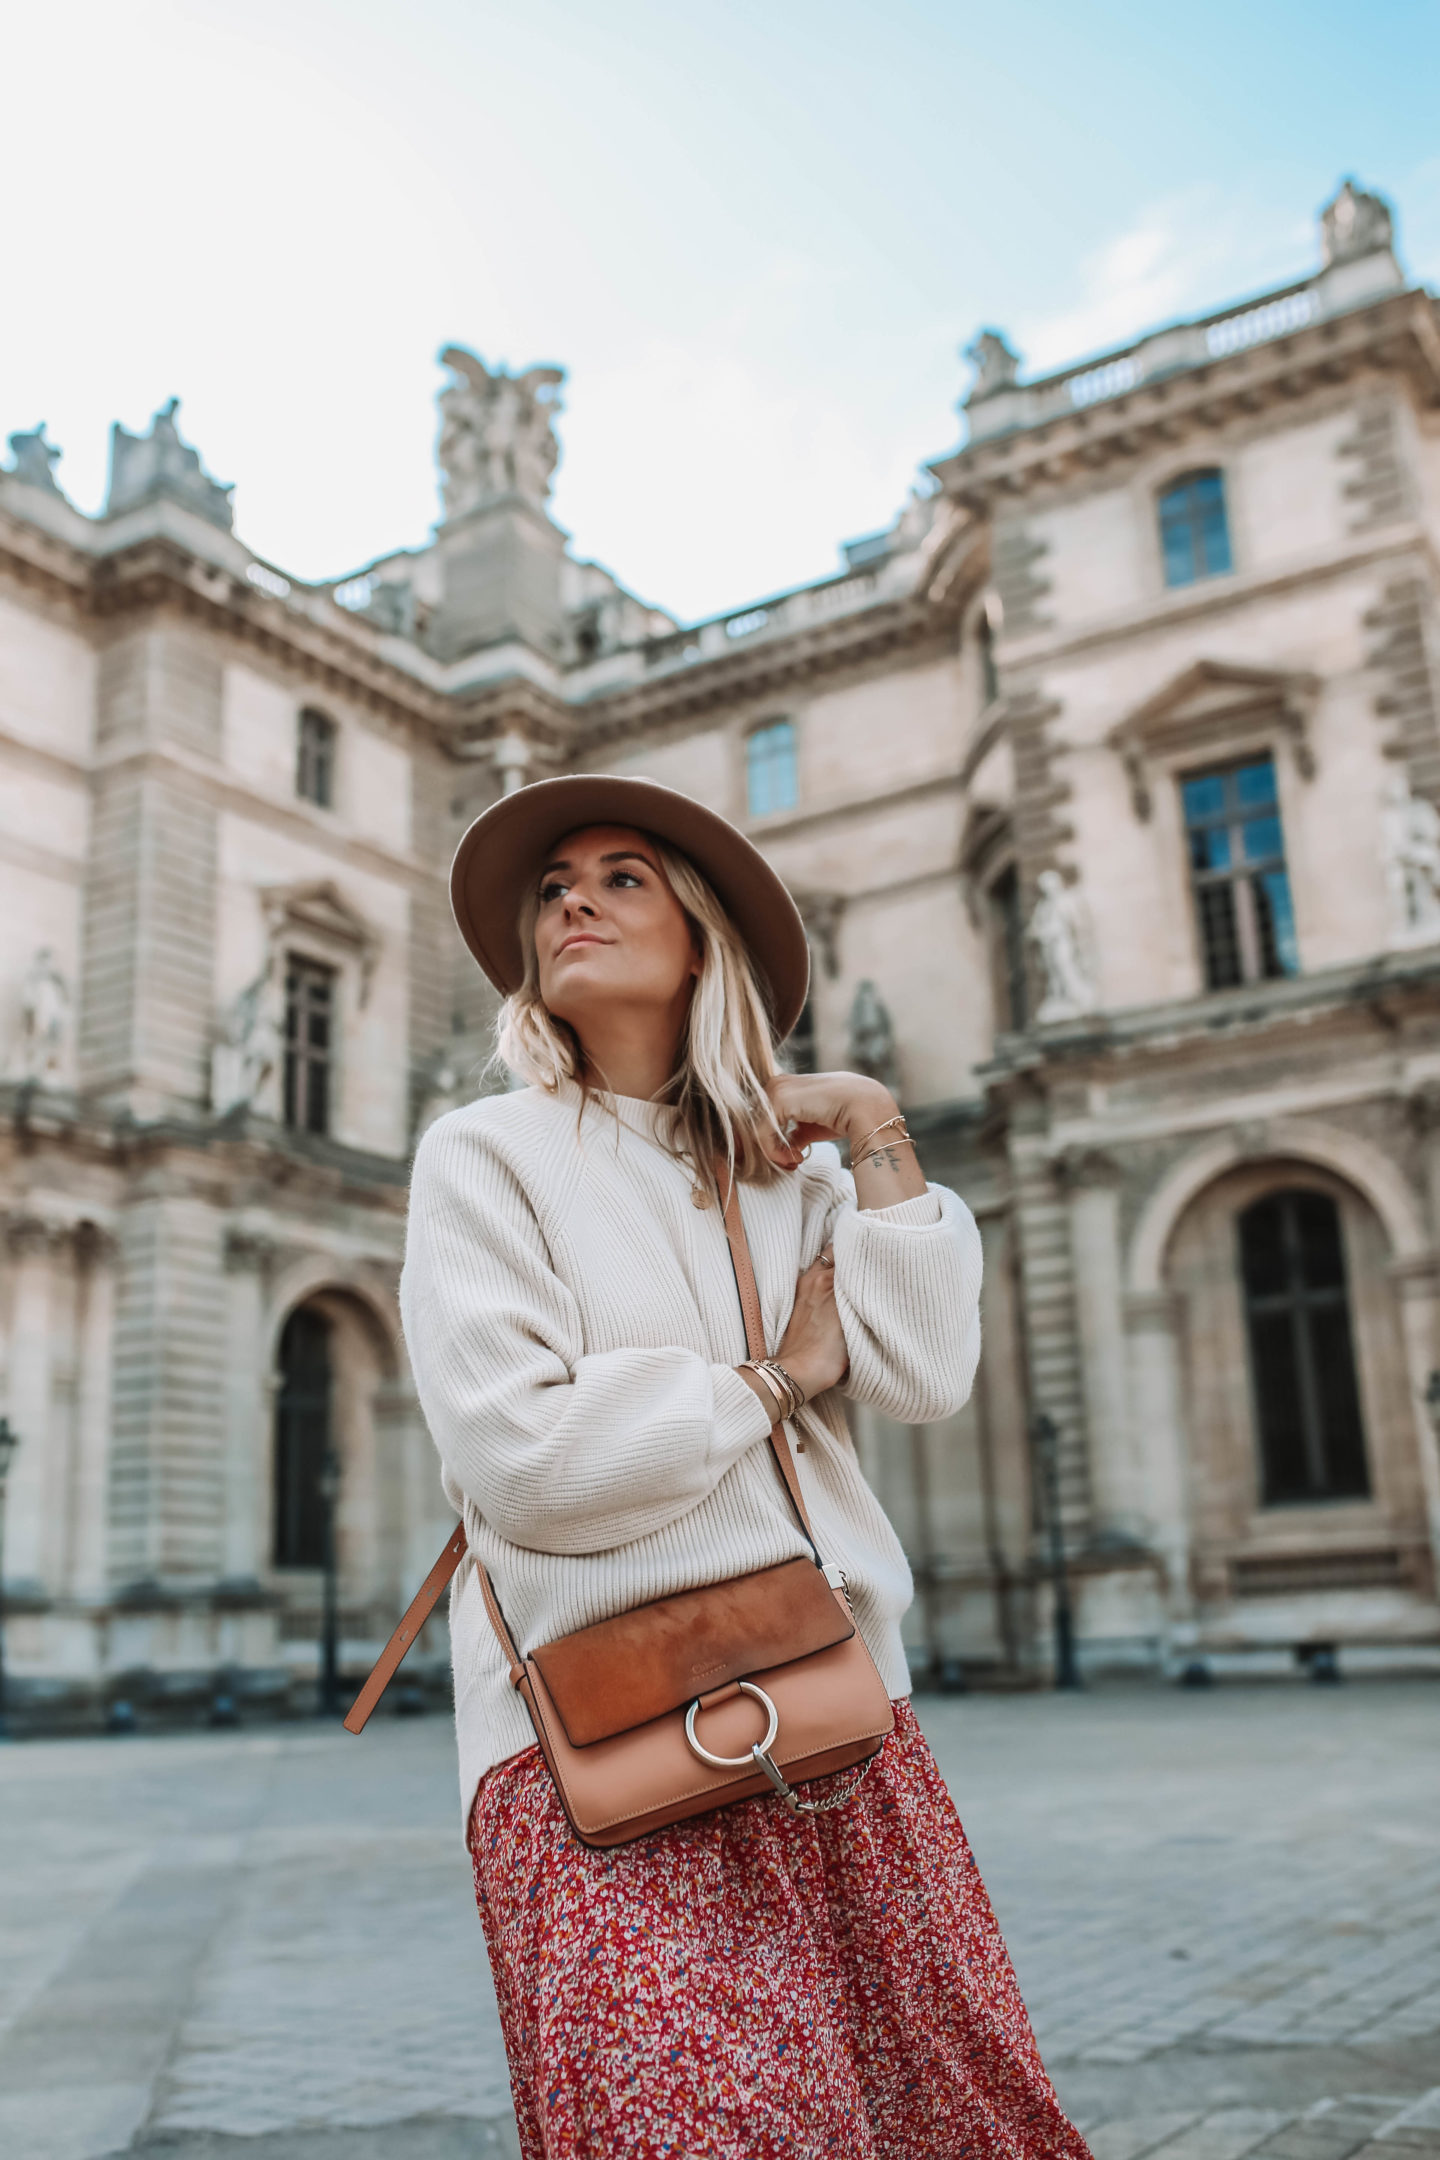 Sac Faye Chloé - Blondie Baby blog mode Paris et voyages